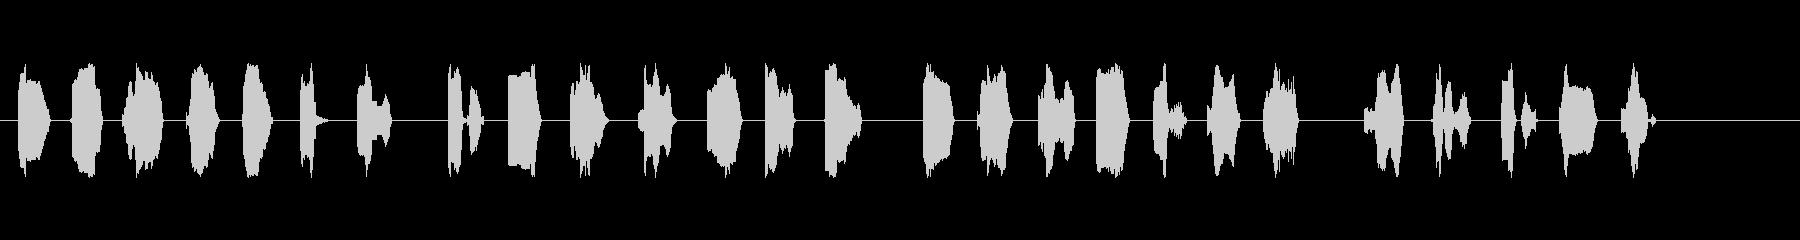 A-Zまでのラジオボイス。(外国人男性)の未再生の波形